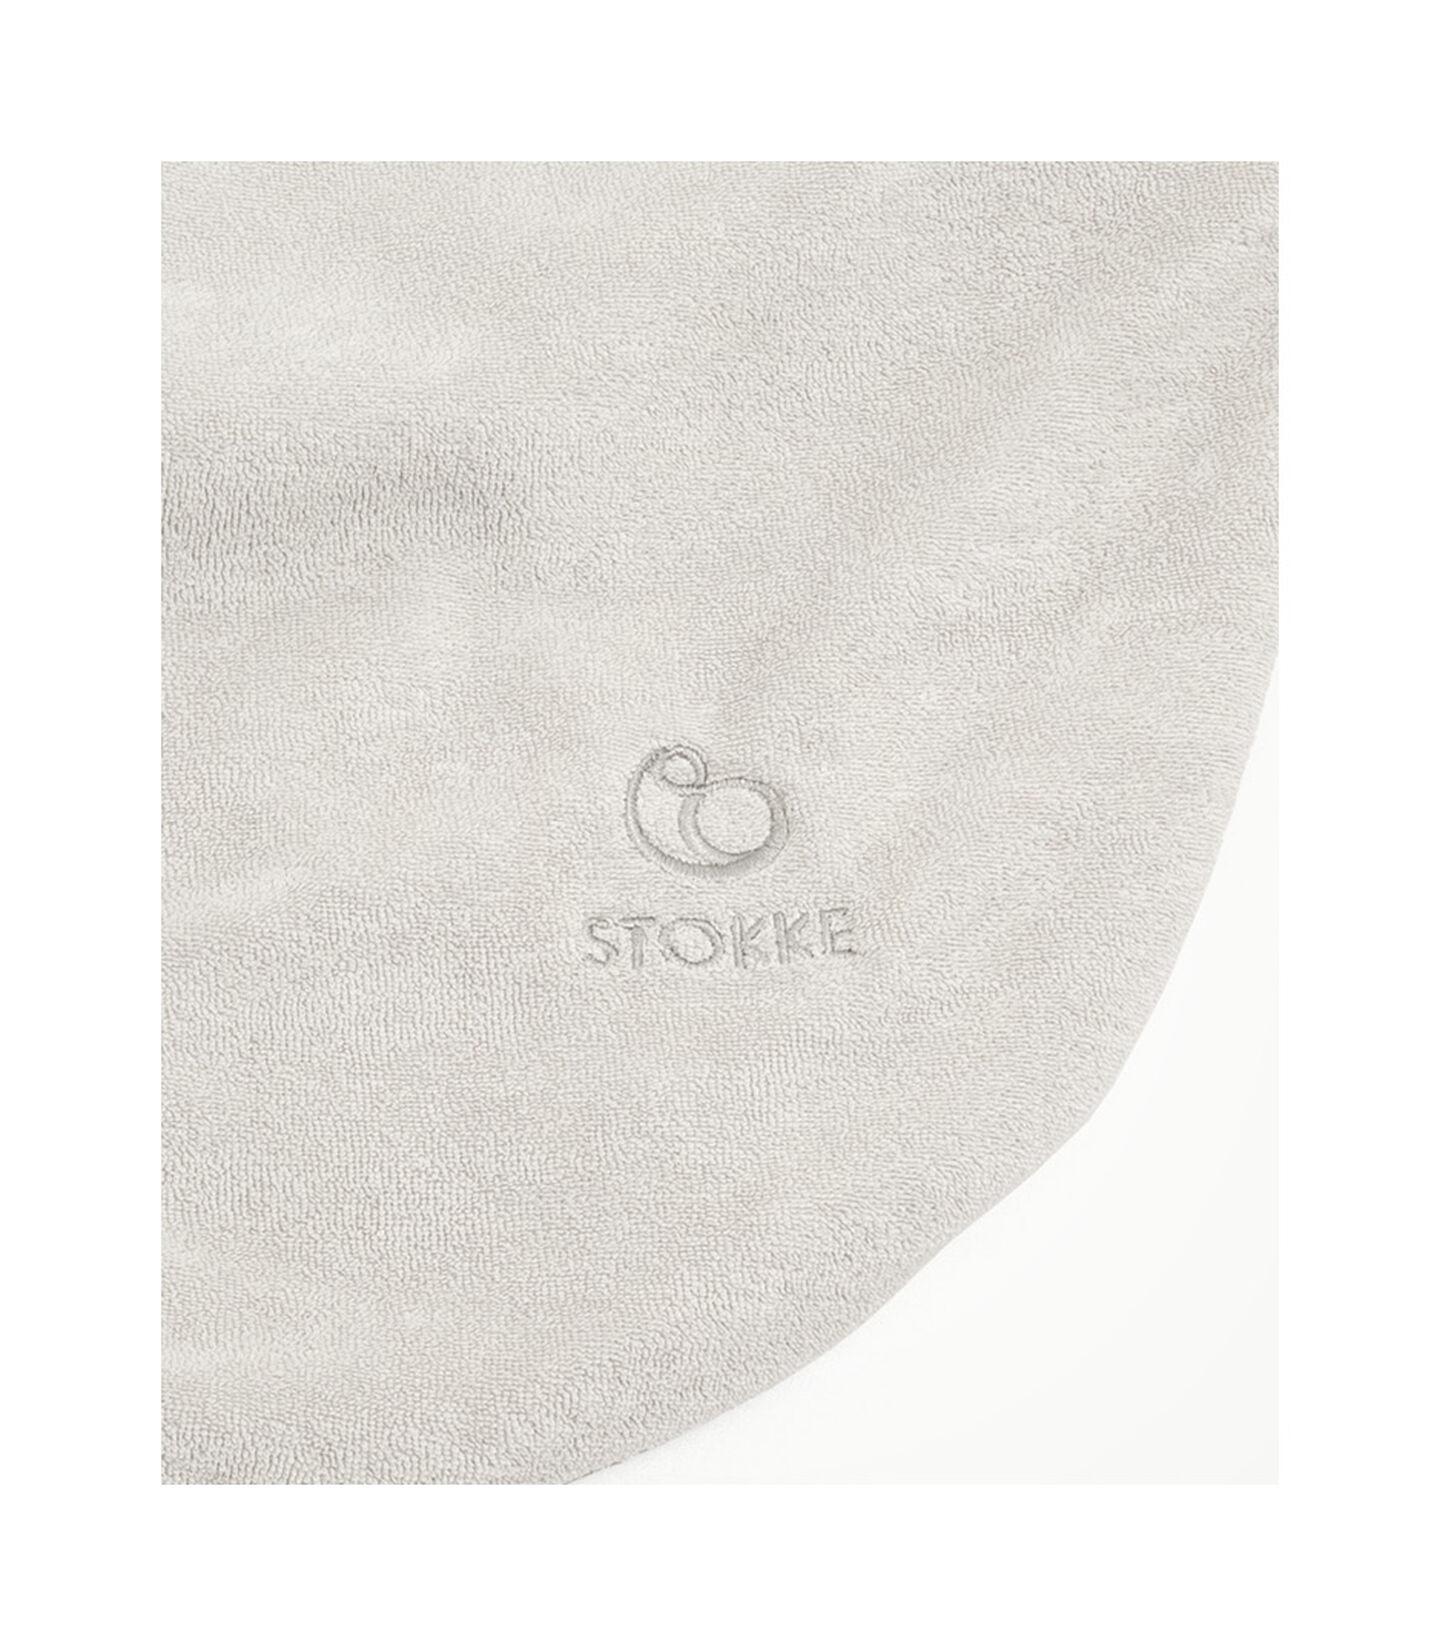 Stokke® Xplory® X Sommerbezug Light Grey, Light Grey, mainview view 3